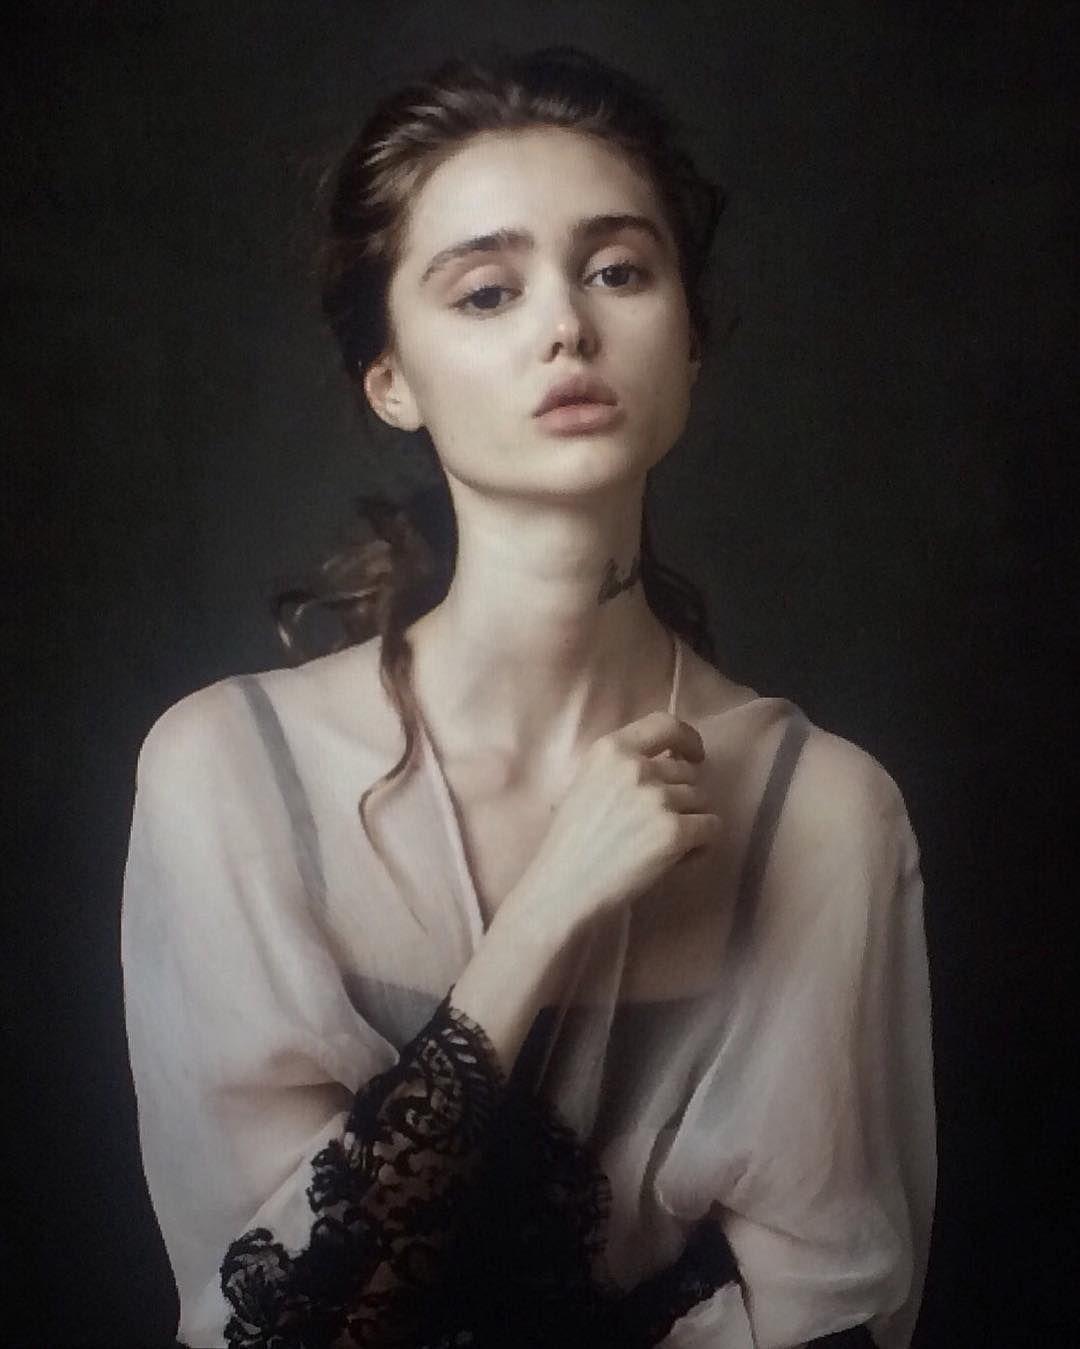 Aliya Galyautdinova Nude Photos 25